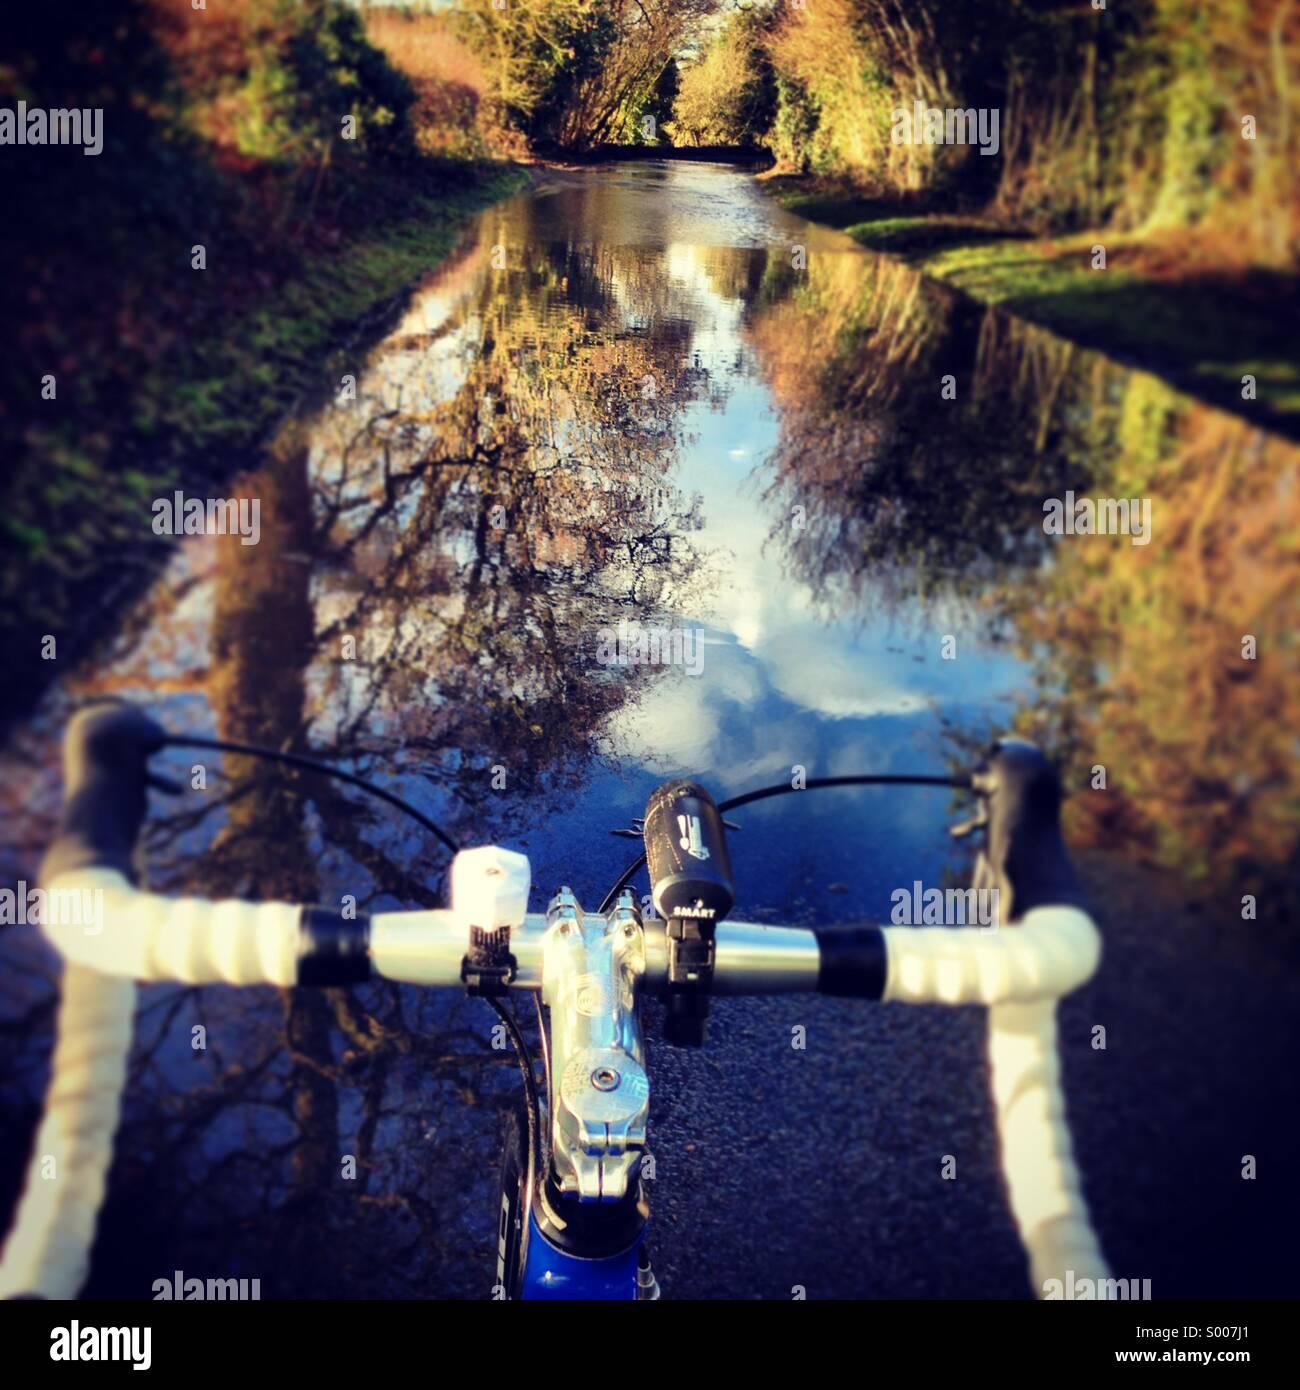 Bicycle handlebars on winter ride through floods uk - Stock Image